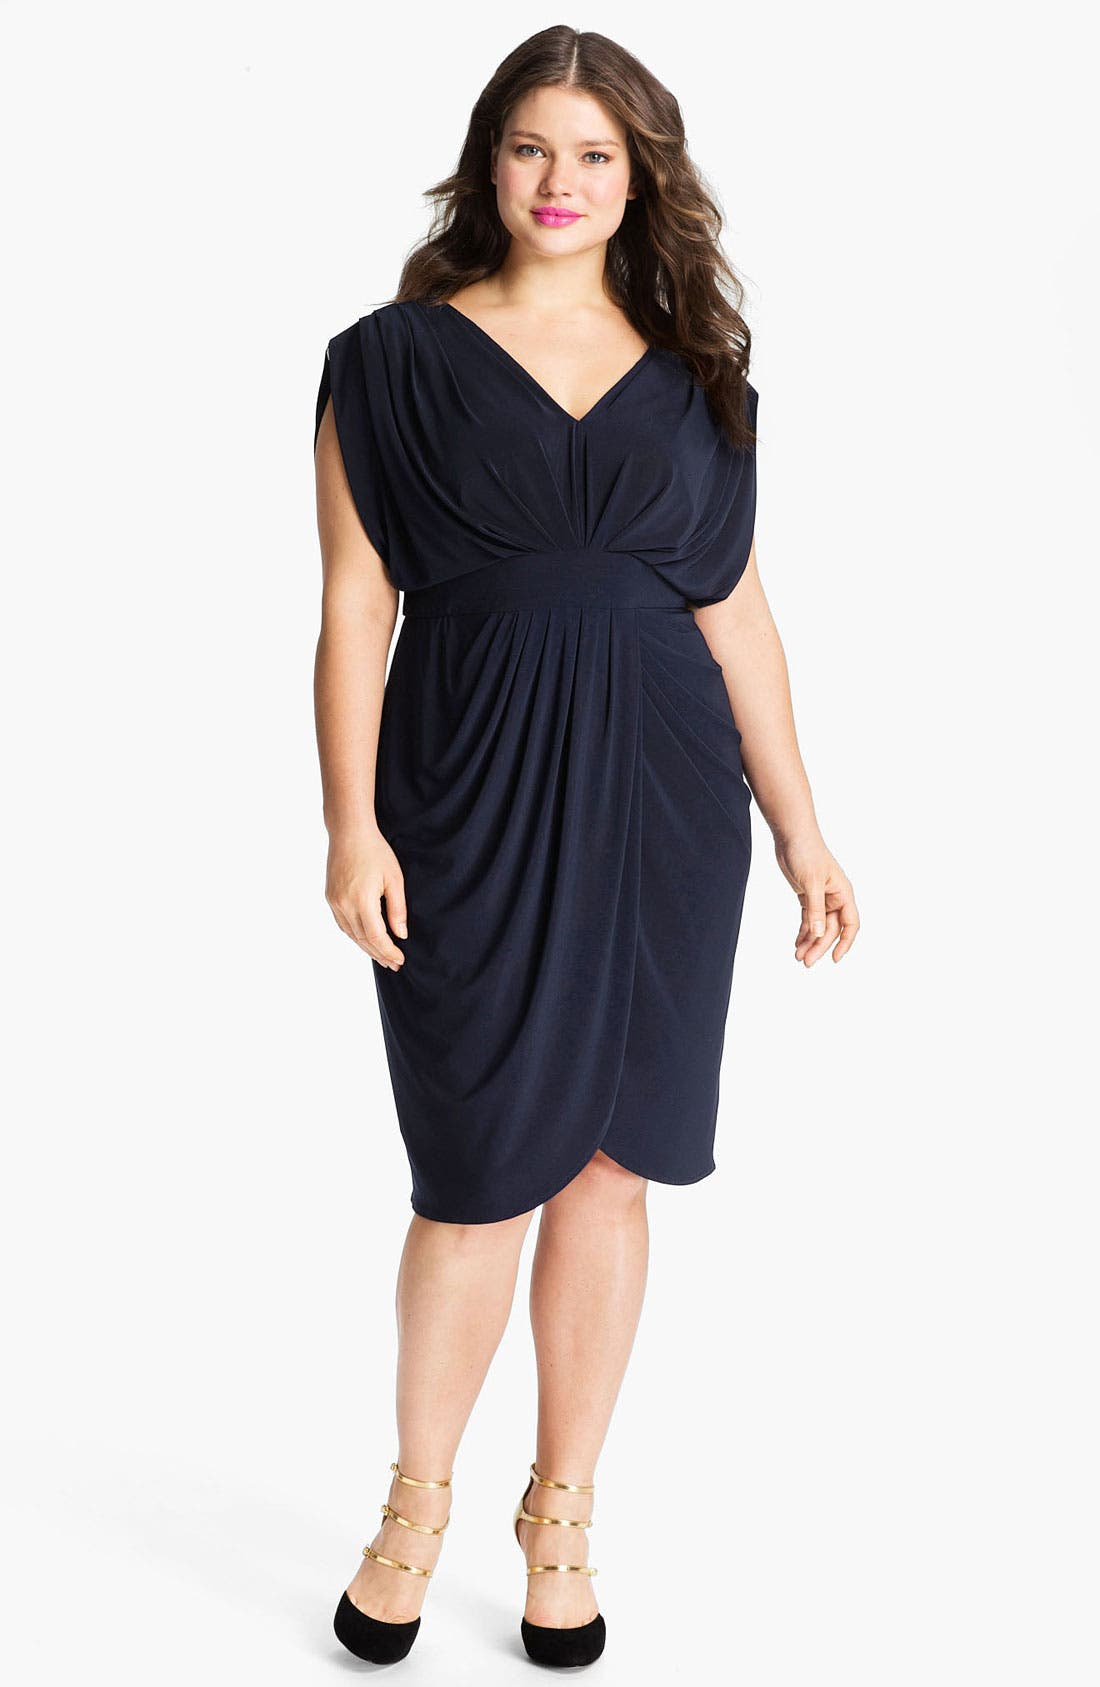 Main Image - Suzi Chin for Maggy Boutique V-Neck Faux Wrap Jersey Dress (Plus Size)